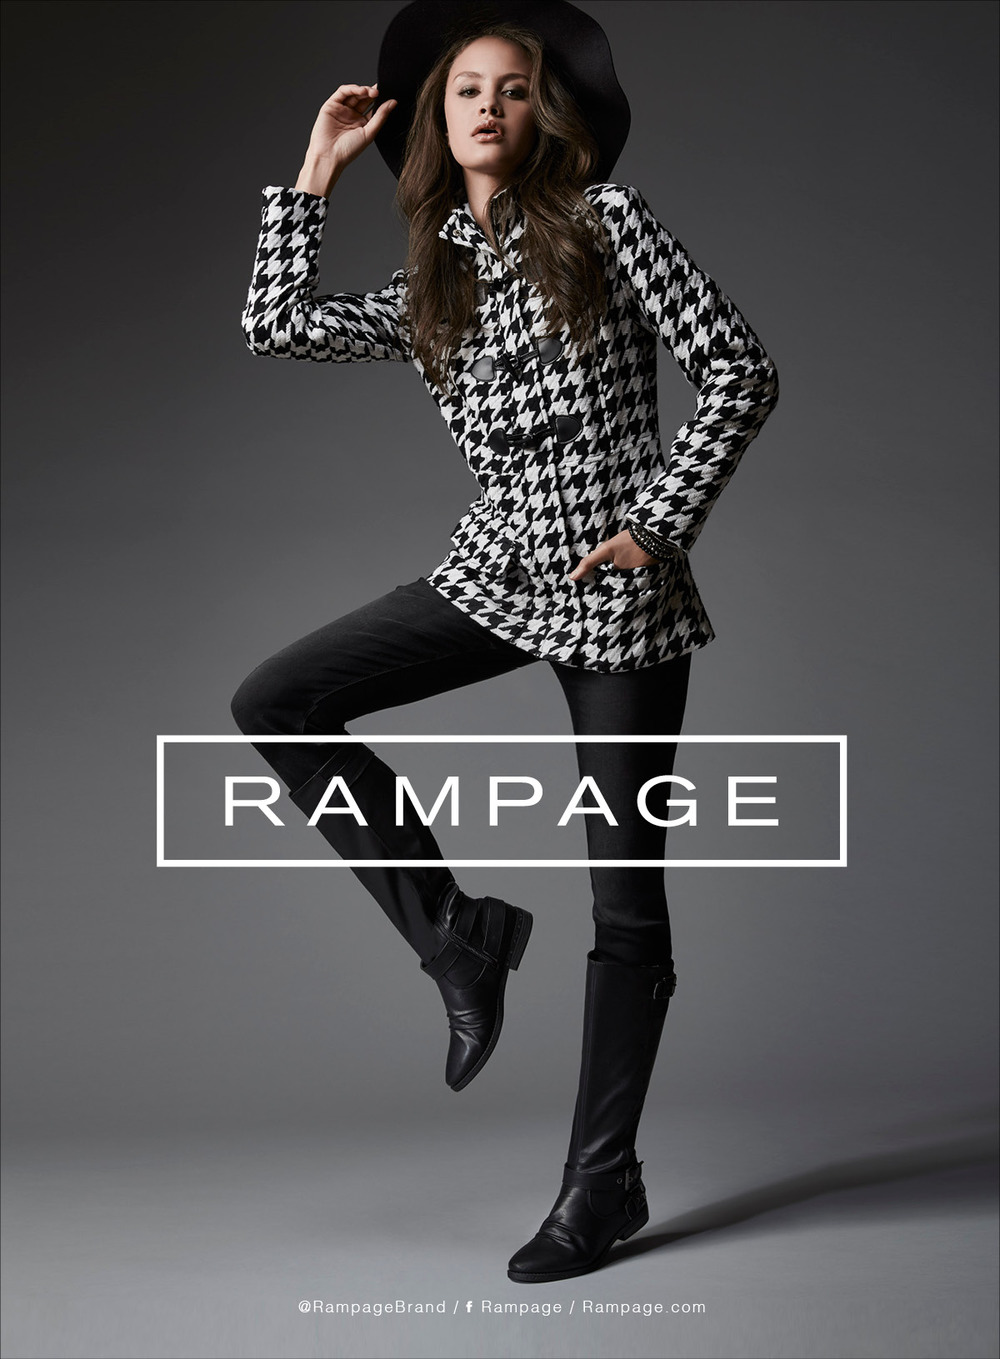 150327_Rampage_FallConcepts_Layout216_BF3.jpg